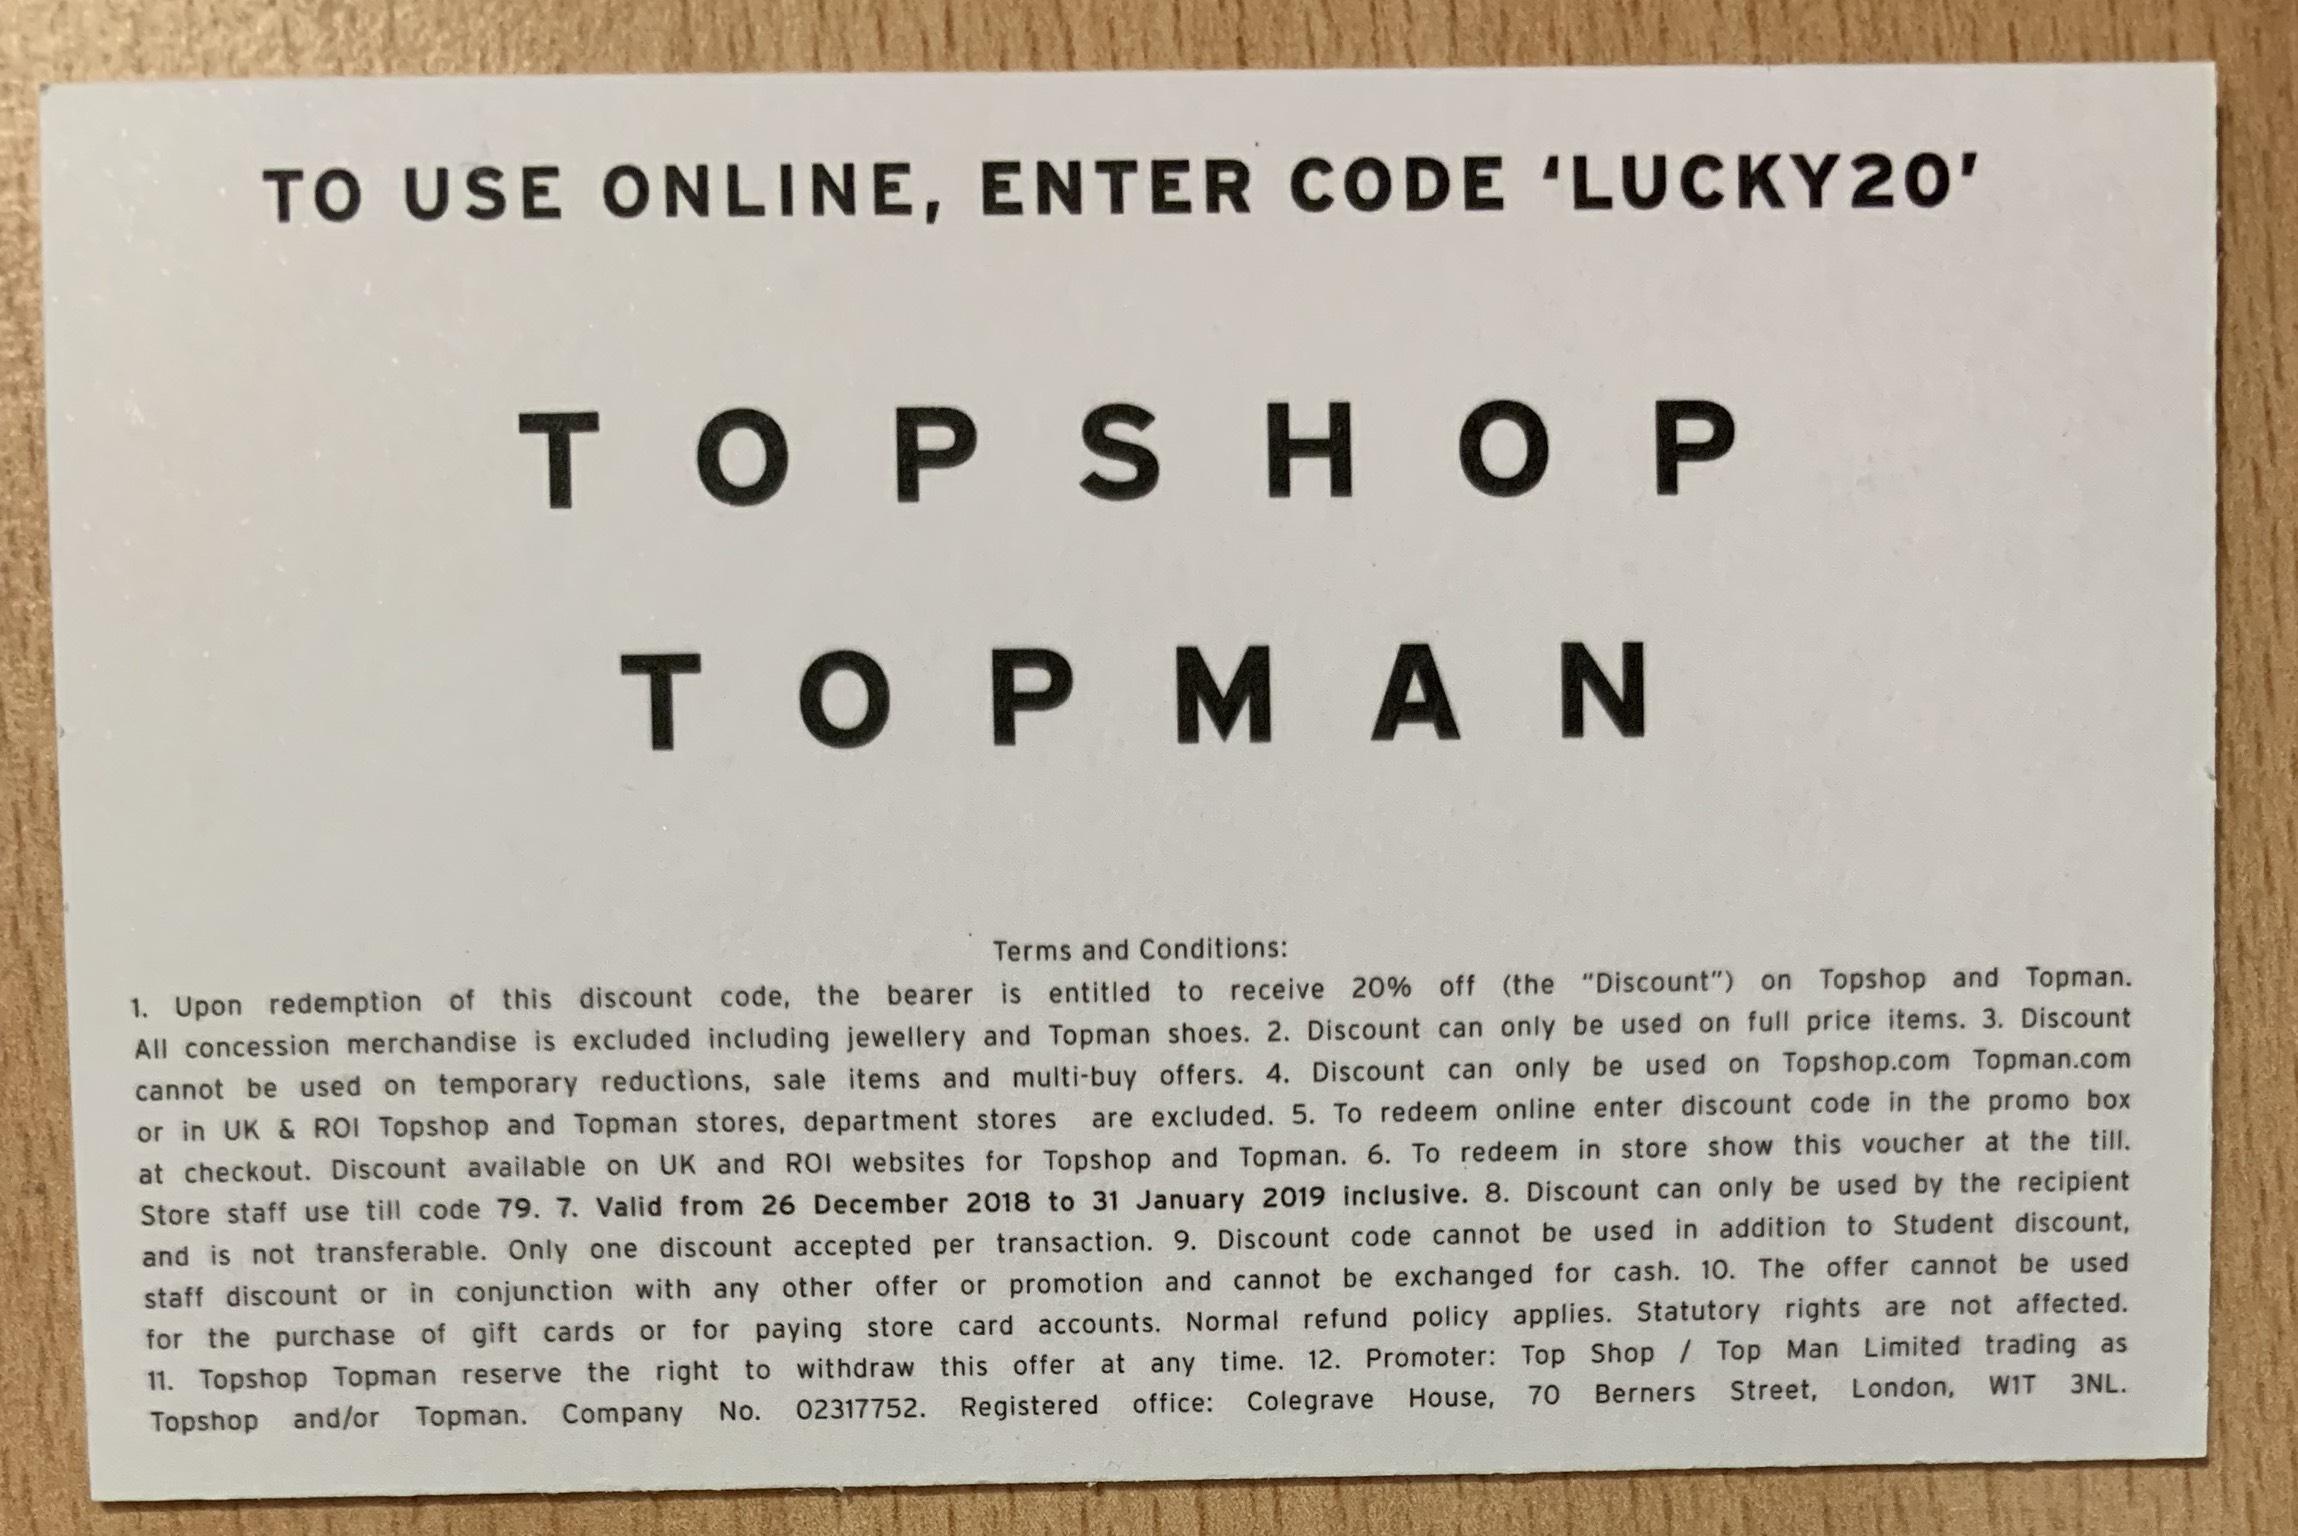 20% off Topshop/Topman (Dec 26-Jan 31)